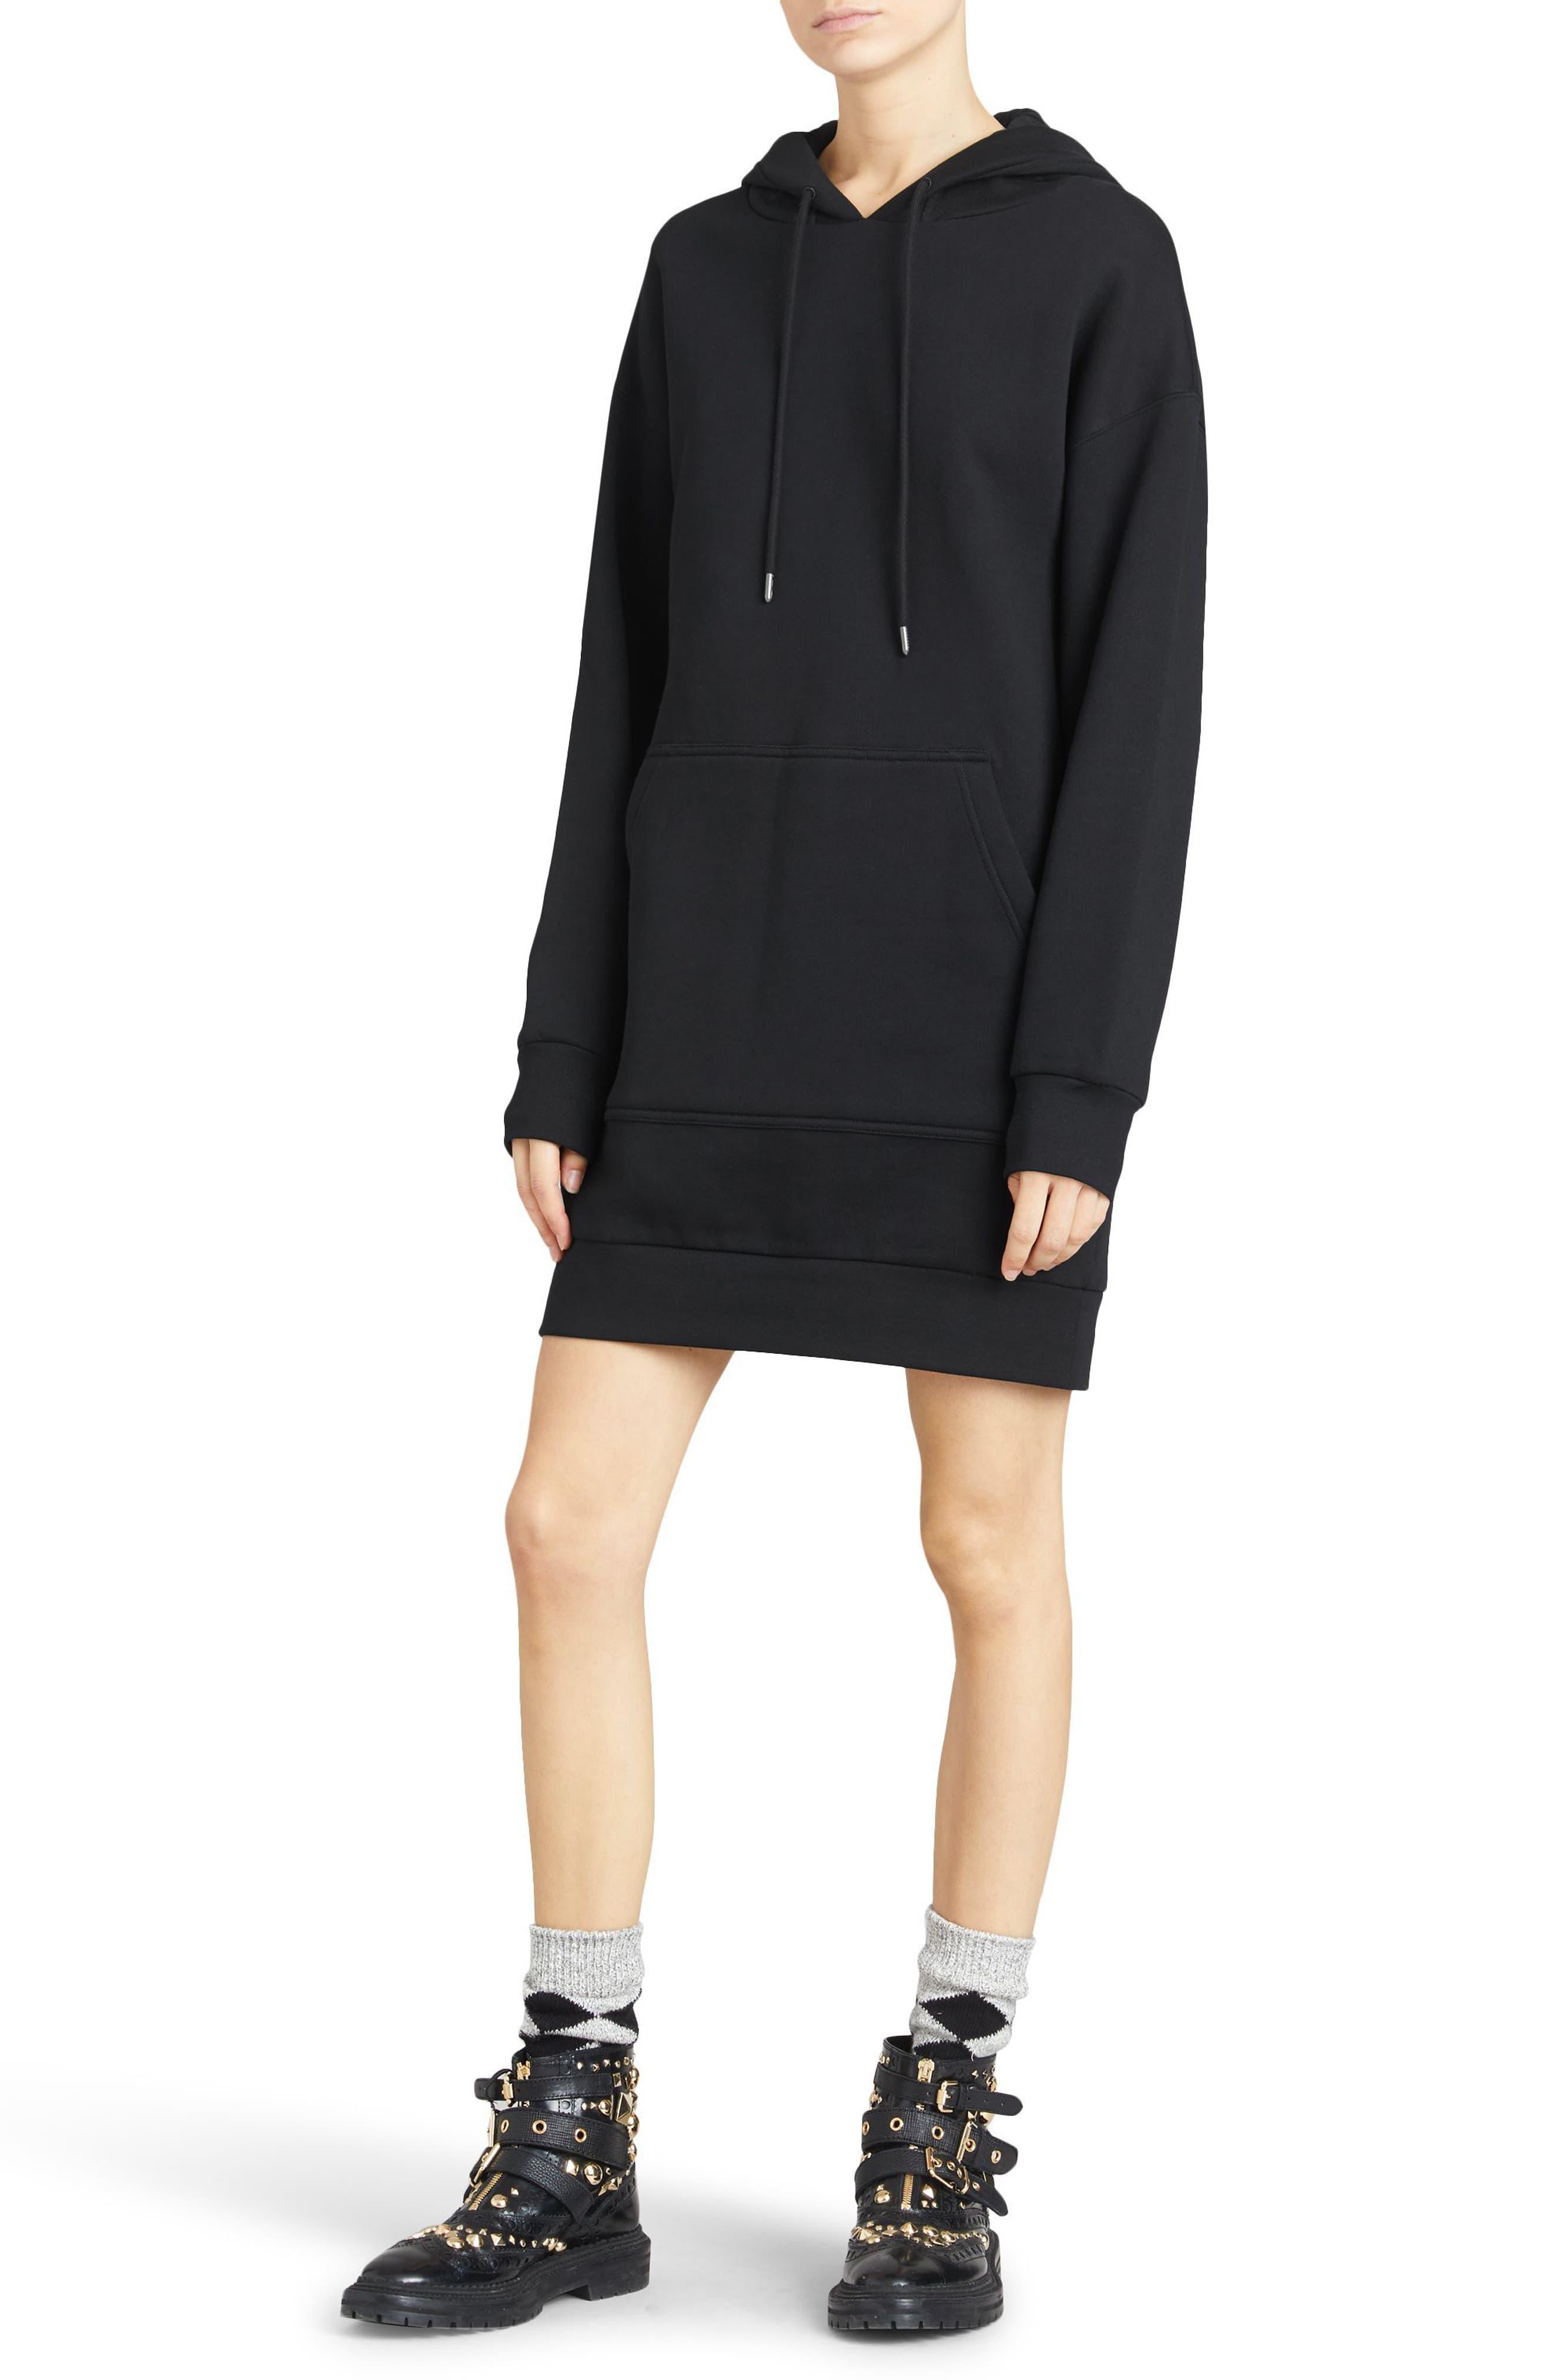 Cardeiver Jersey Sweatshirt Dress,                             Alternate thumbnail 5, color,                             001